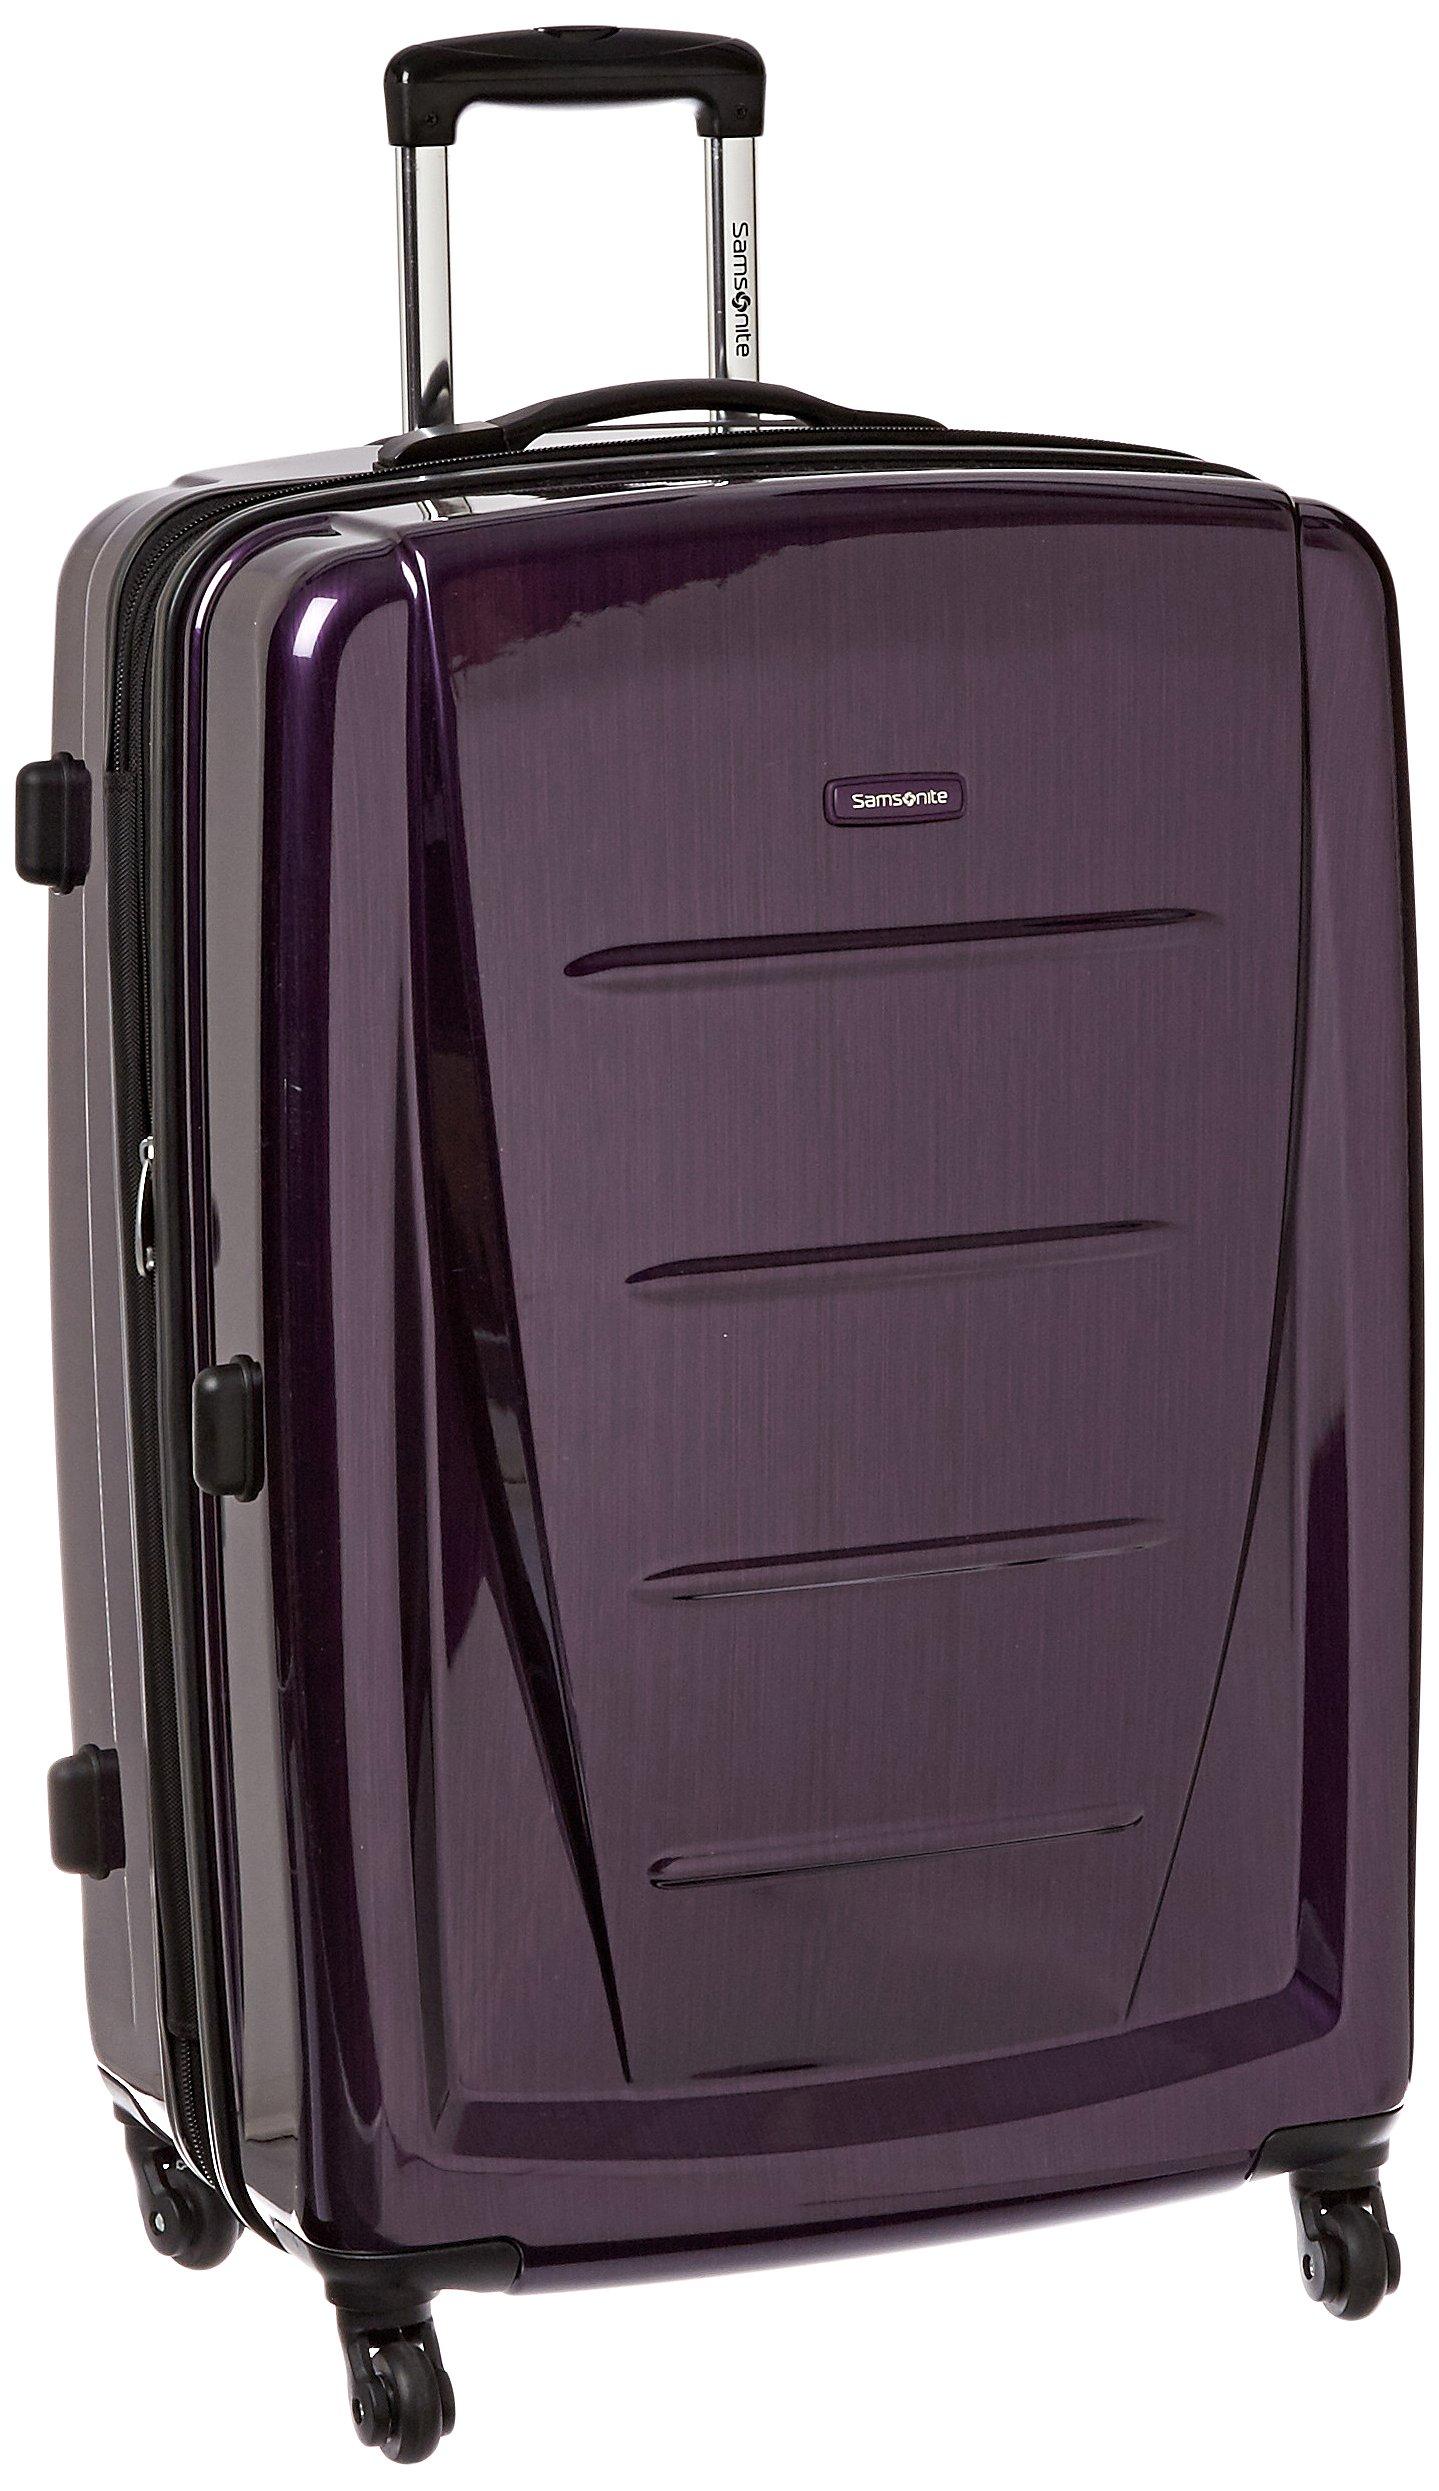 Samsonite Winfield 2 Fashion 28'' Spinner Luggage Purple